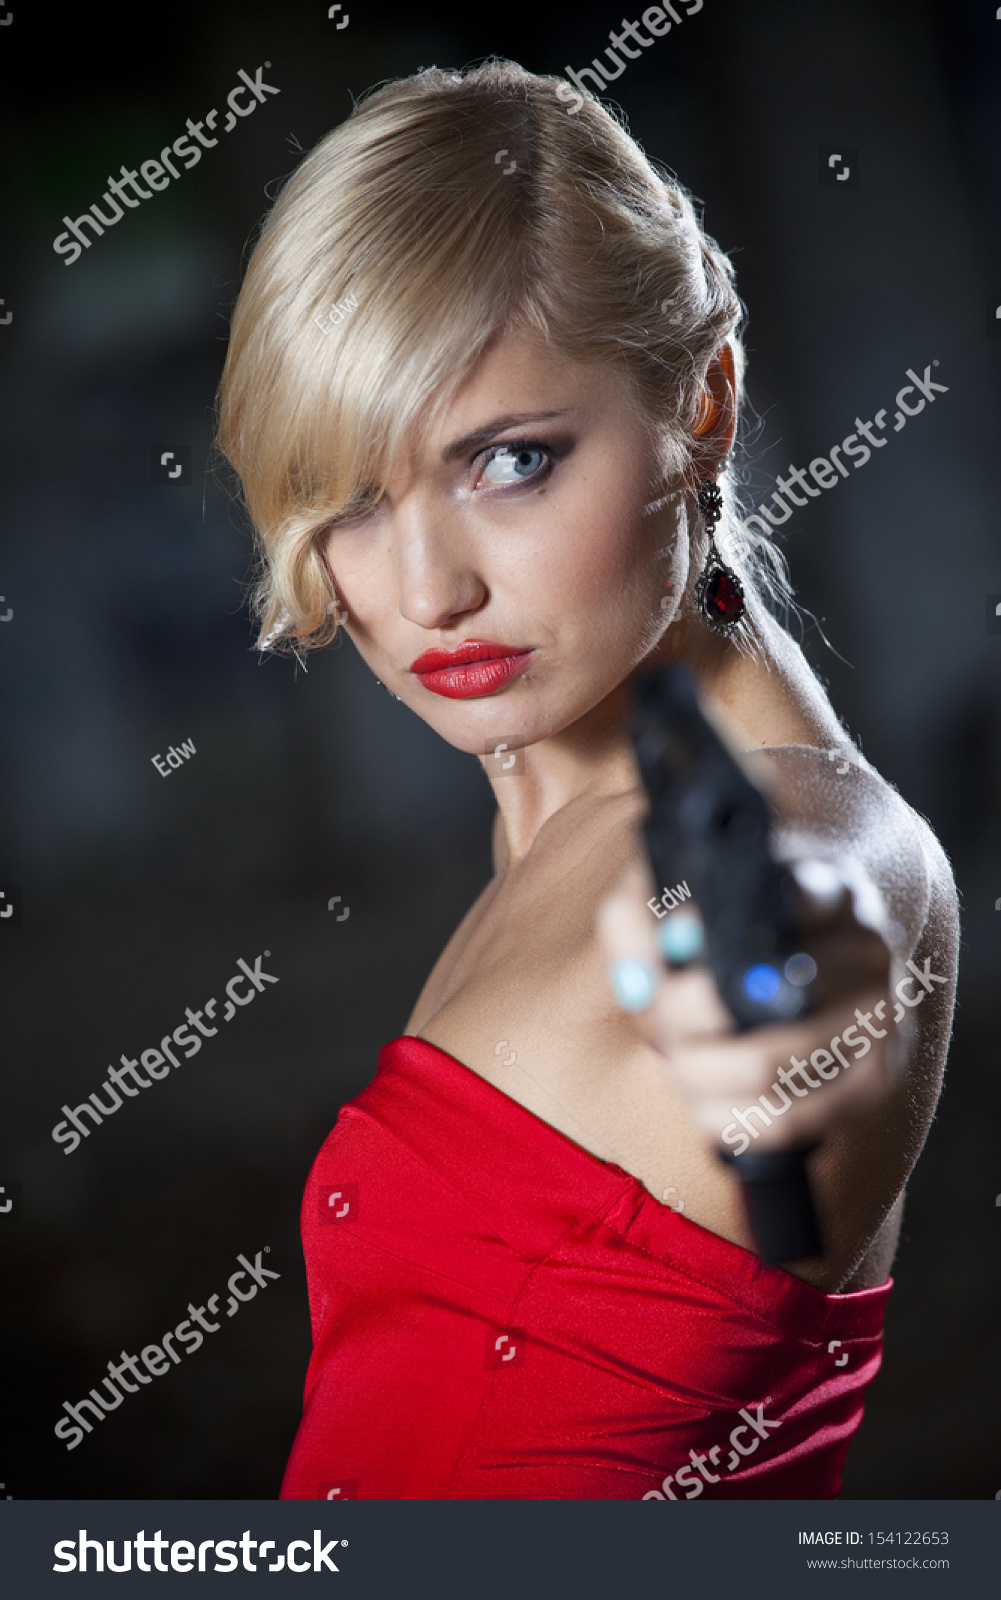 Sexy Shooting Targets Woman \x3cb\x3eshooting\x3c/b\x3e stock photos ...